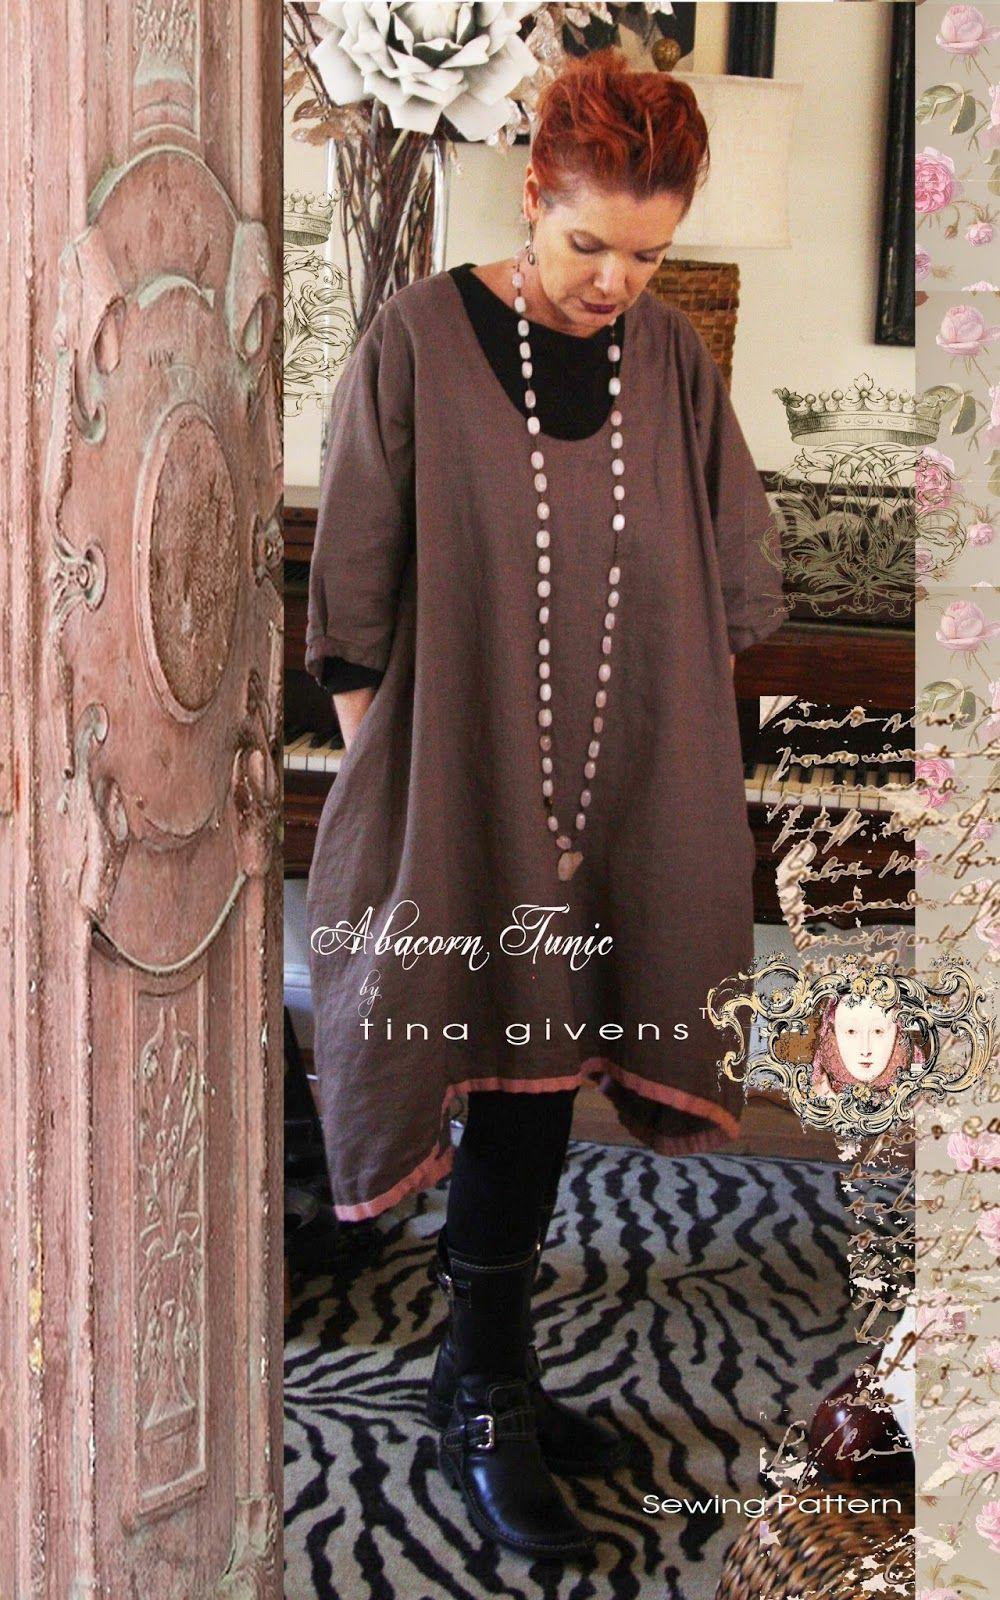 Tina givens new sewing patterns sew tina givens pinterest diy fashion tina givens new sewing patterns jeuxipadfo Images